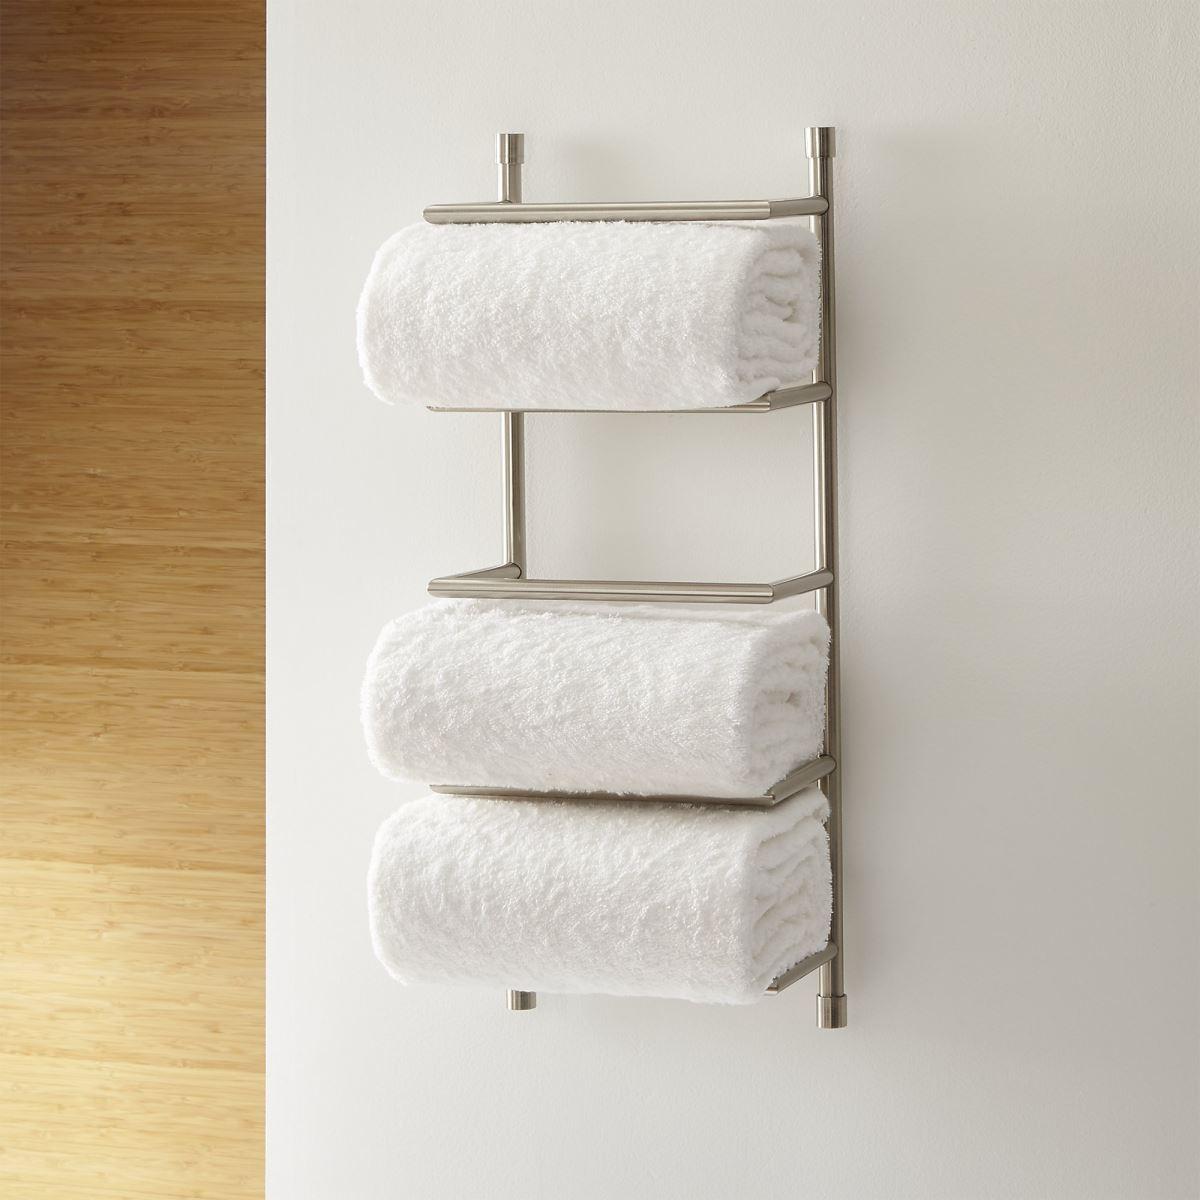 20 tips for an organized bathroom. Black Bedroom Furniture Sets. Home Design Ideas